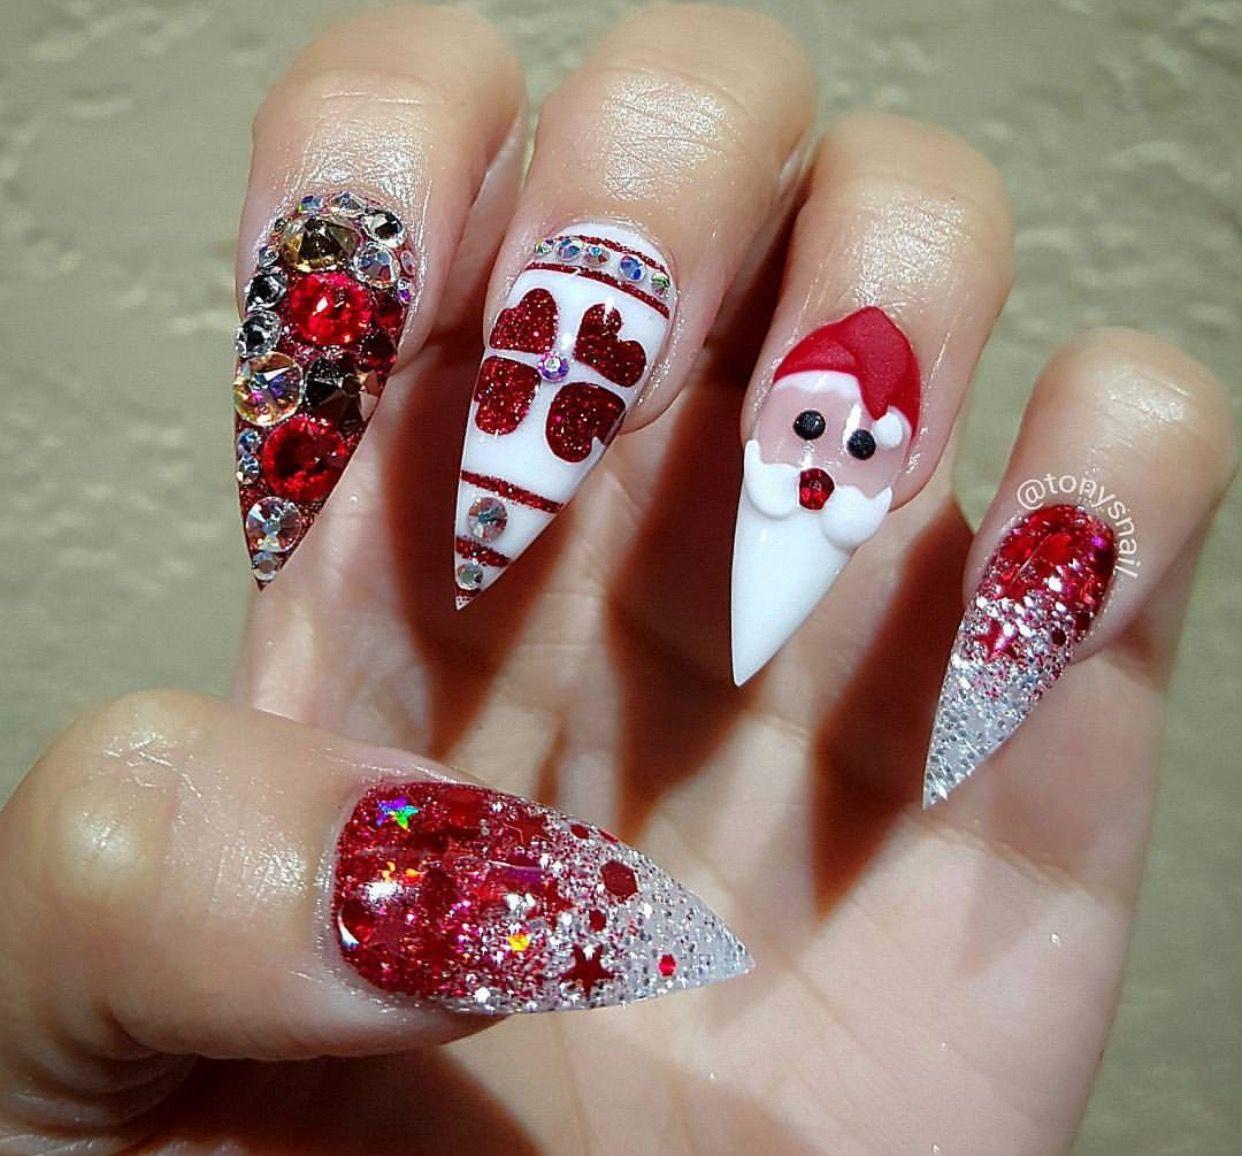 Christmas Stiletto Nails.Custom 3d Christmas Stiletto Nails Winter